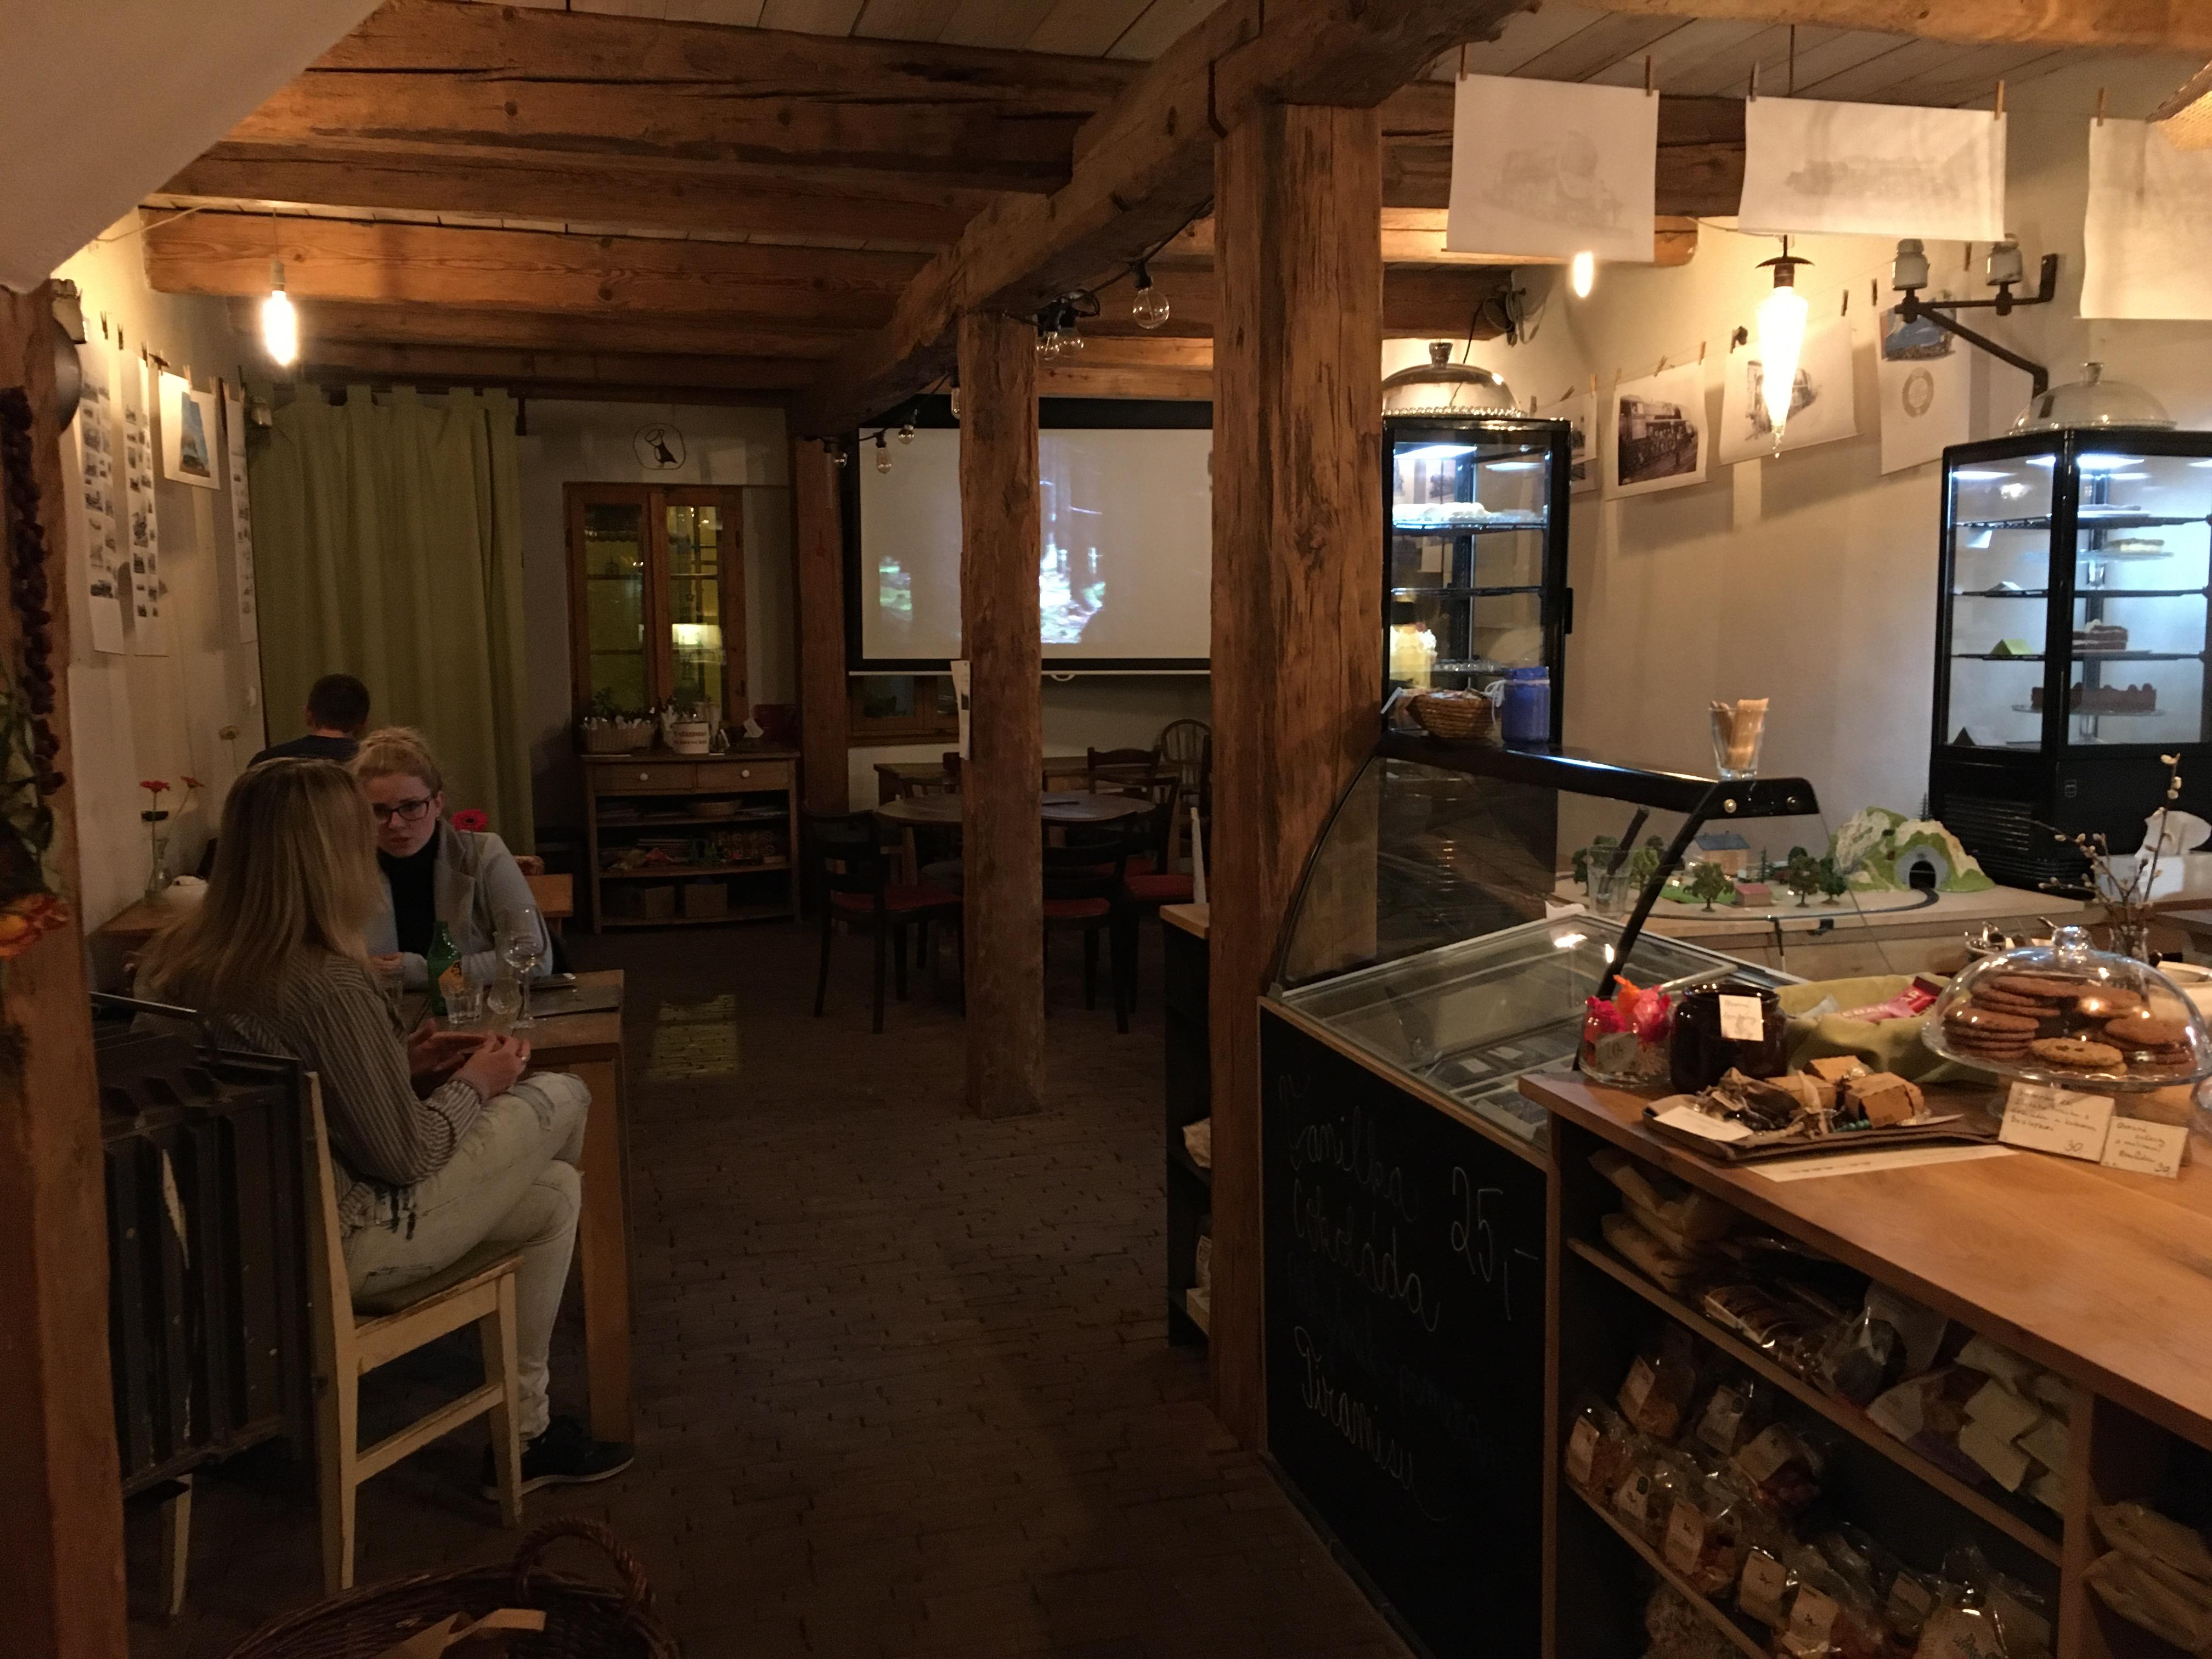 Kaffka Café